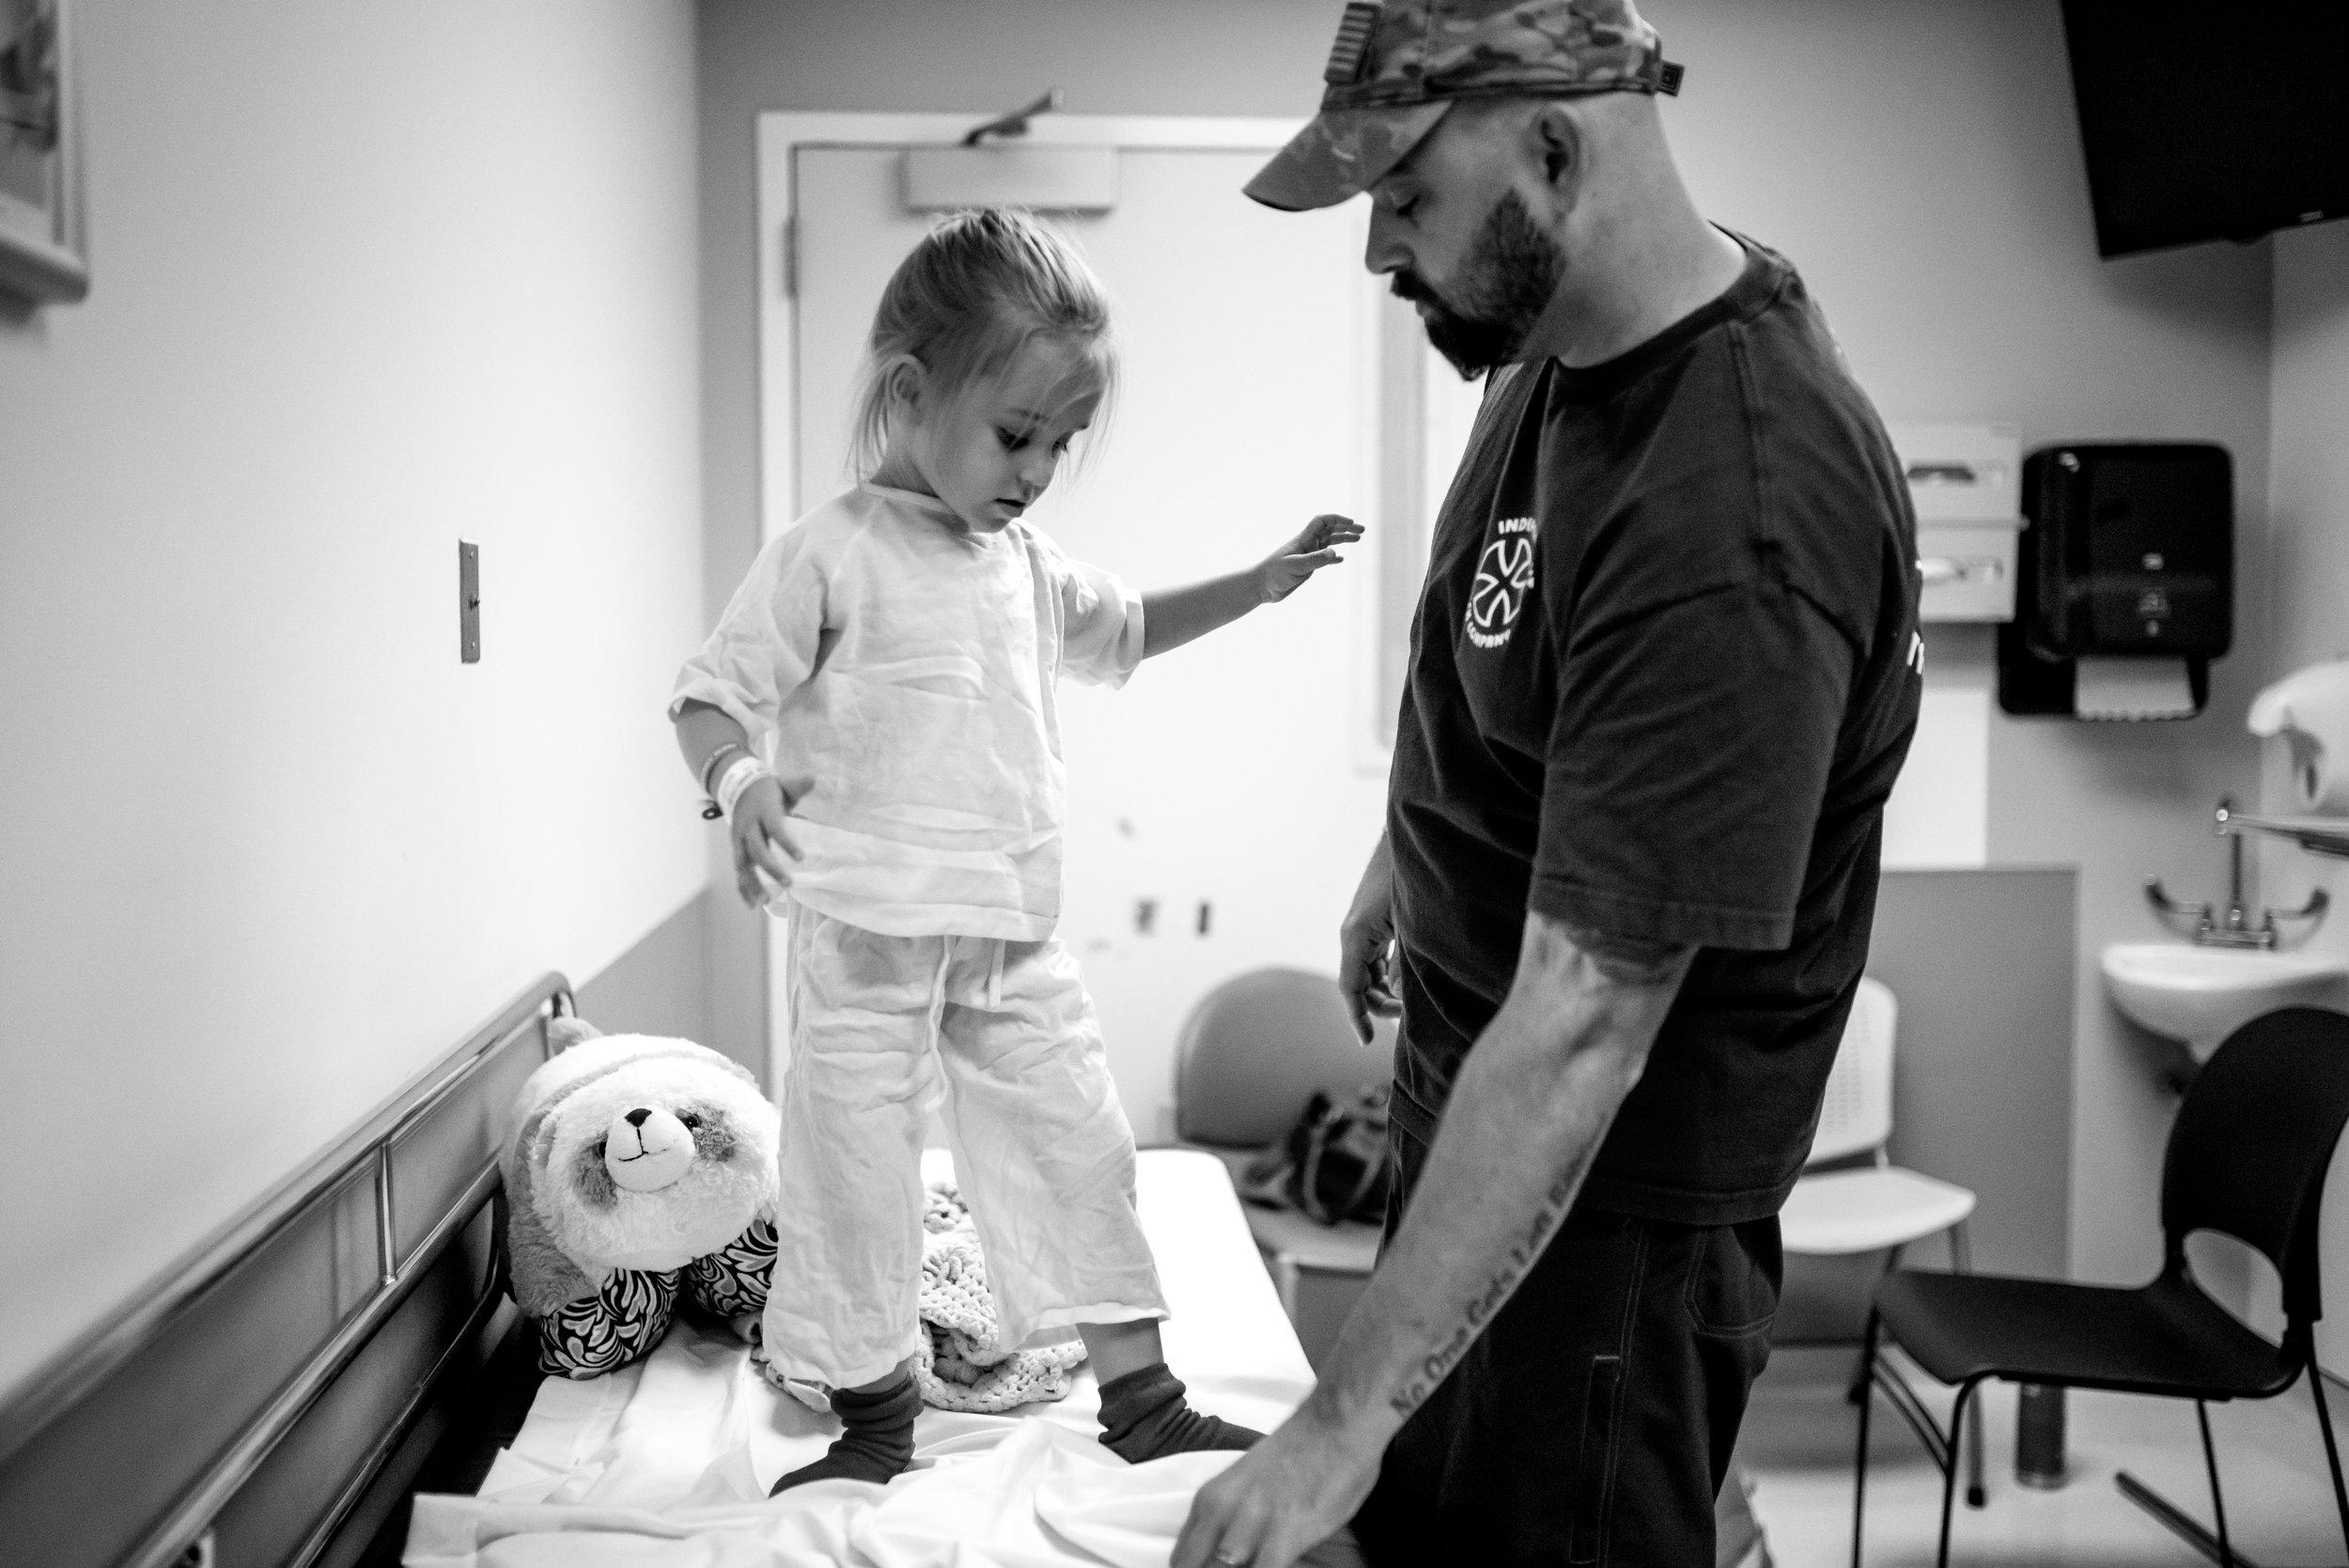 Heart procedure patient looks at slipper socks in surgery prep